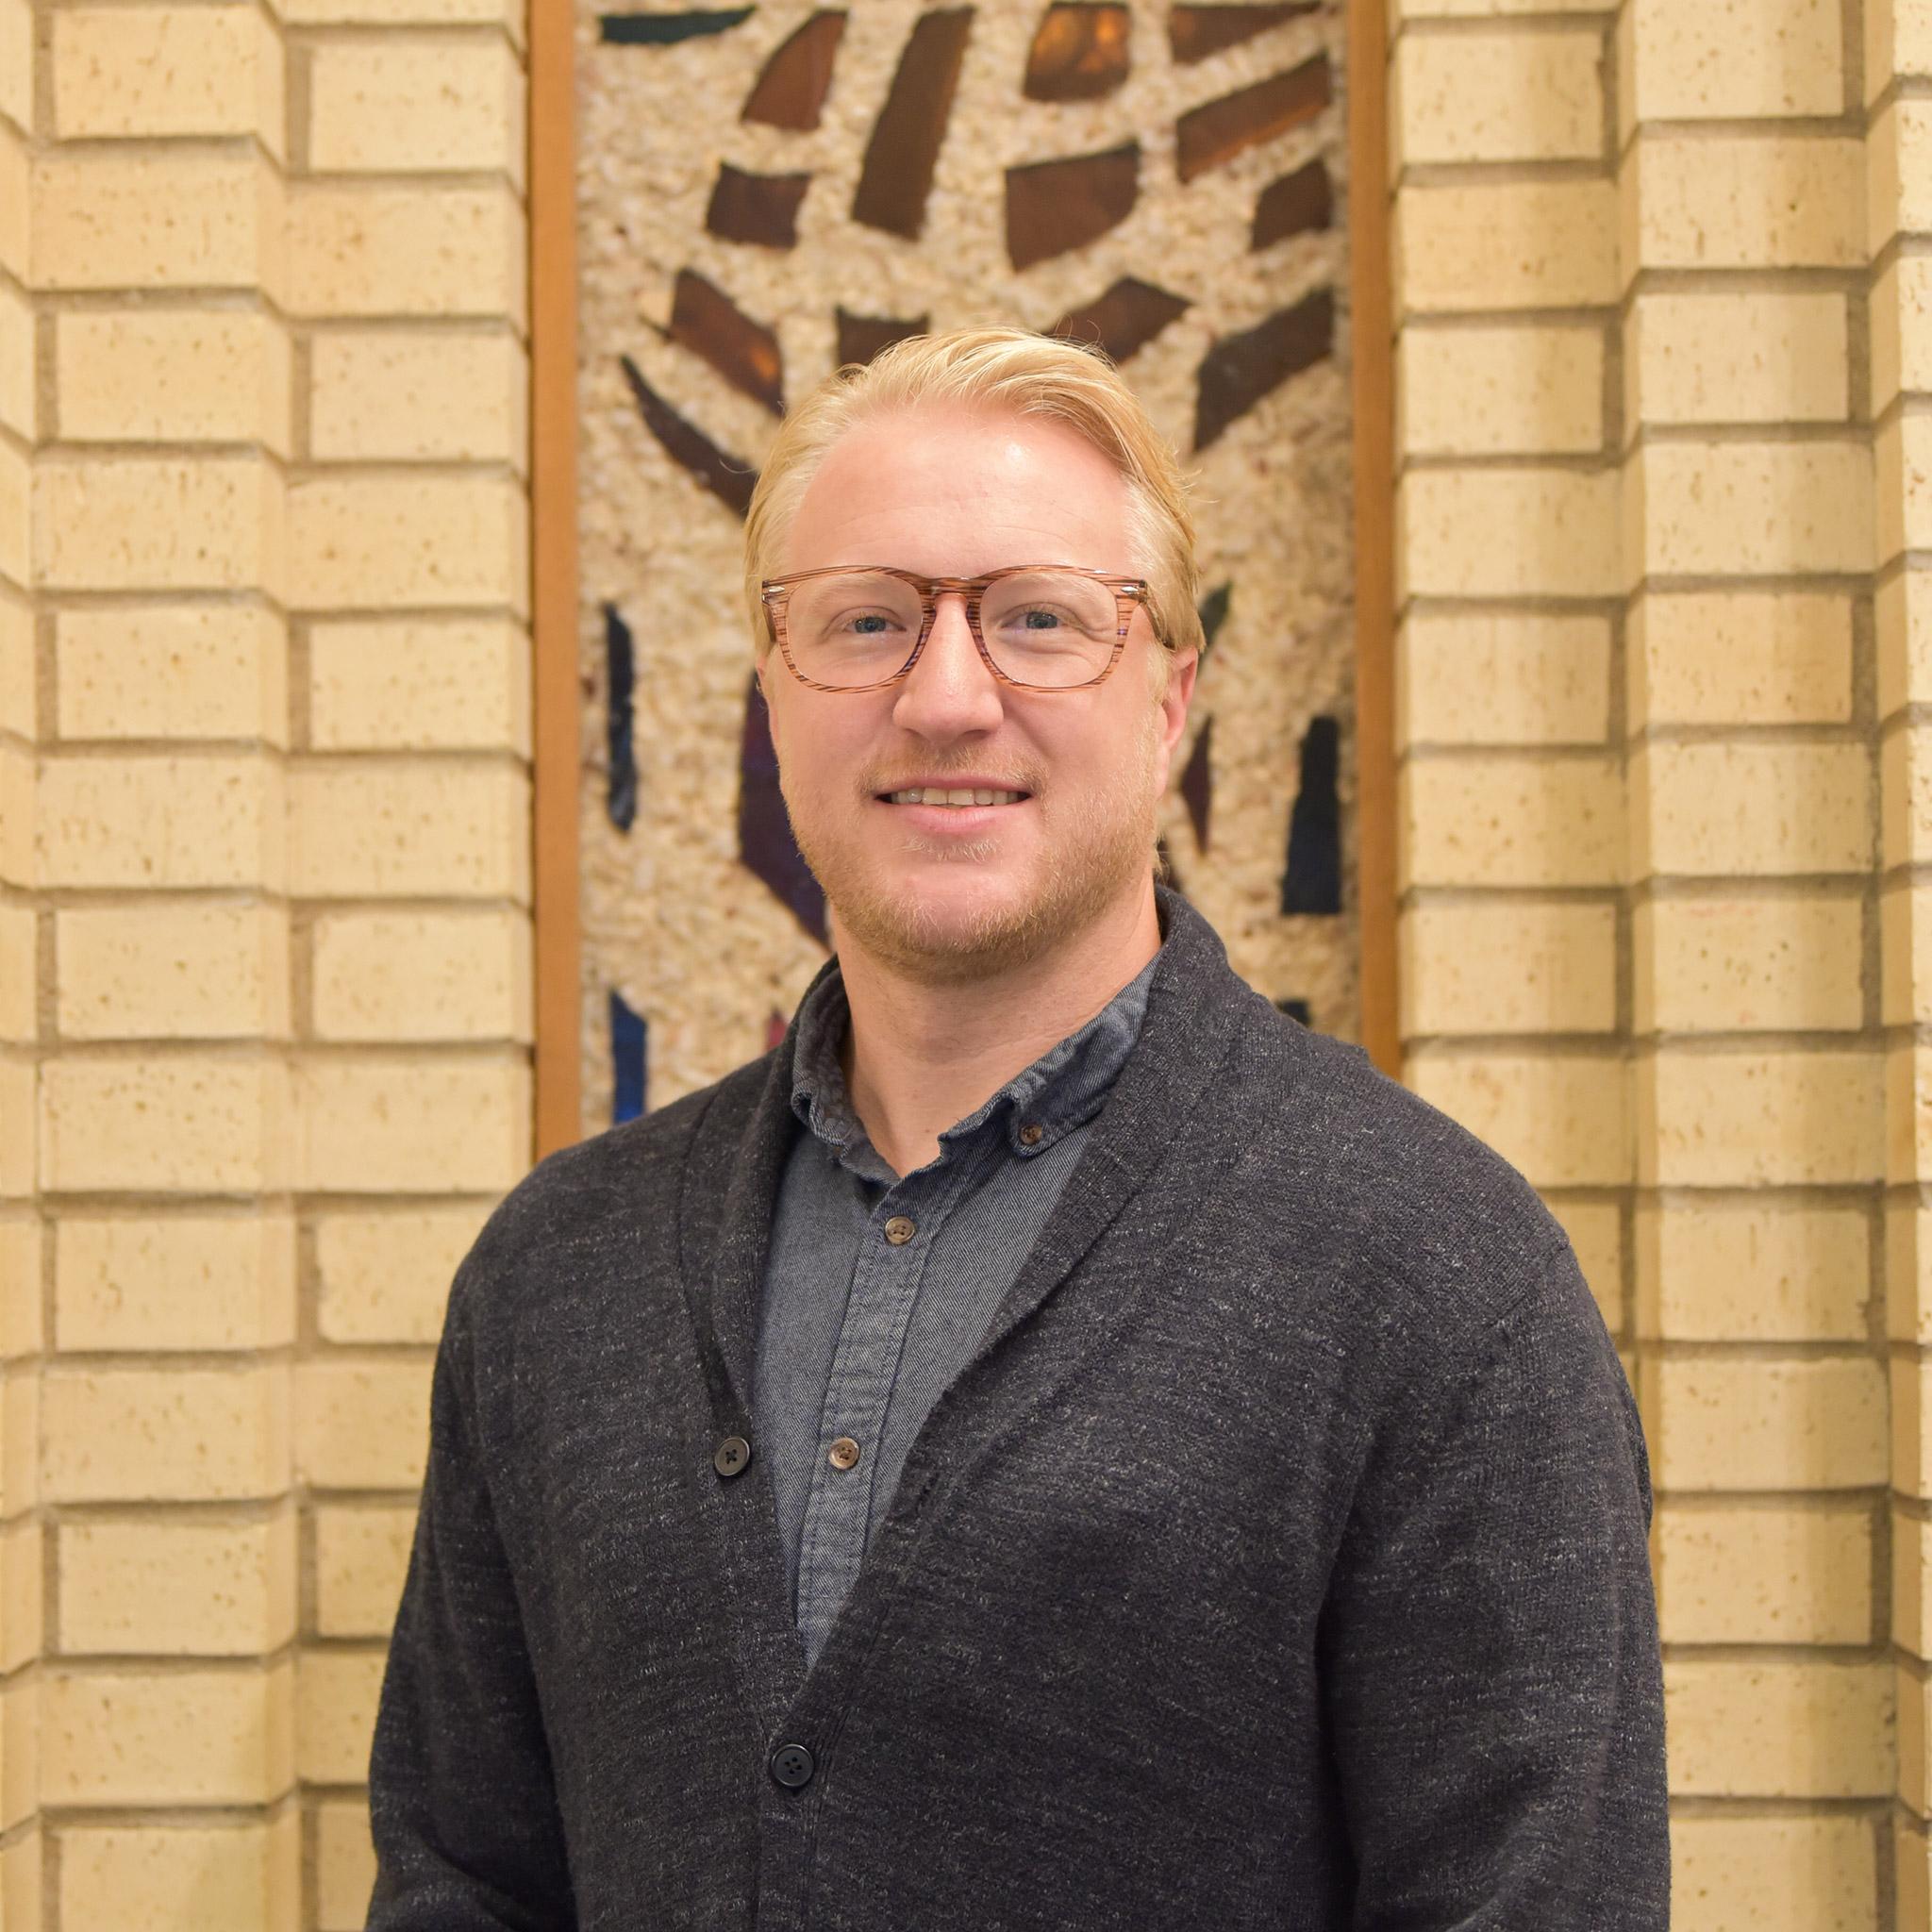 Rev. Jeremiah Lideen, M. Div.